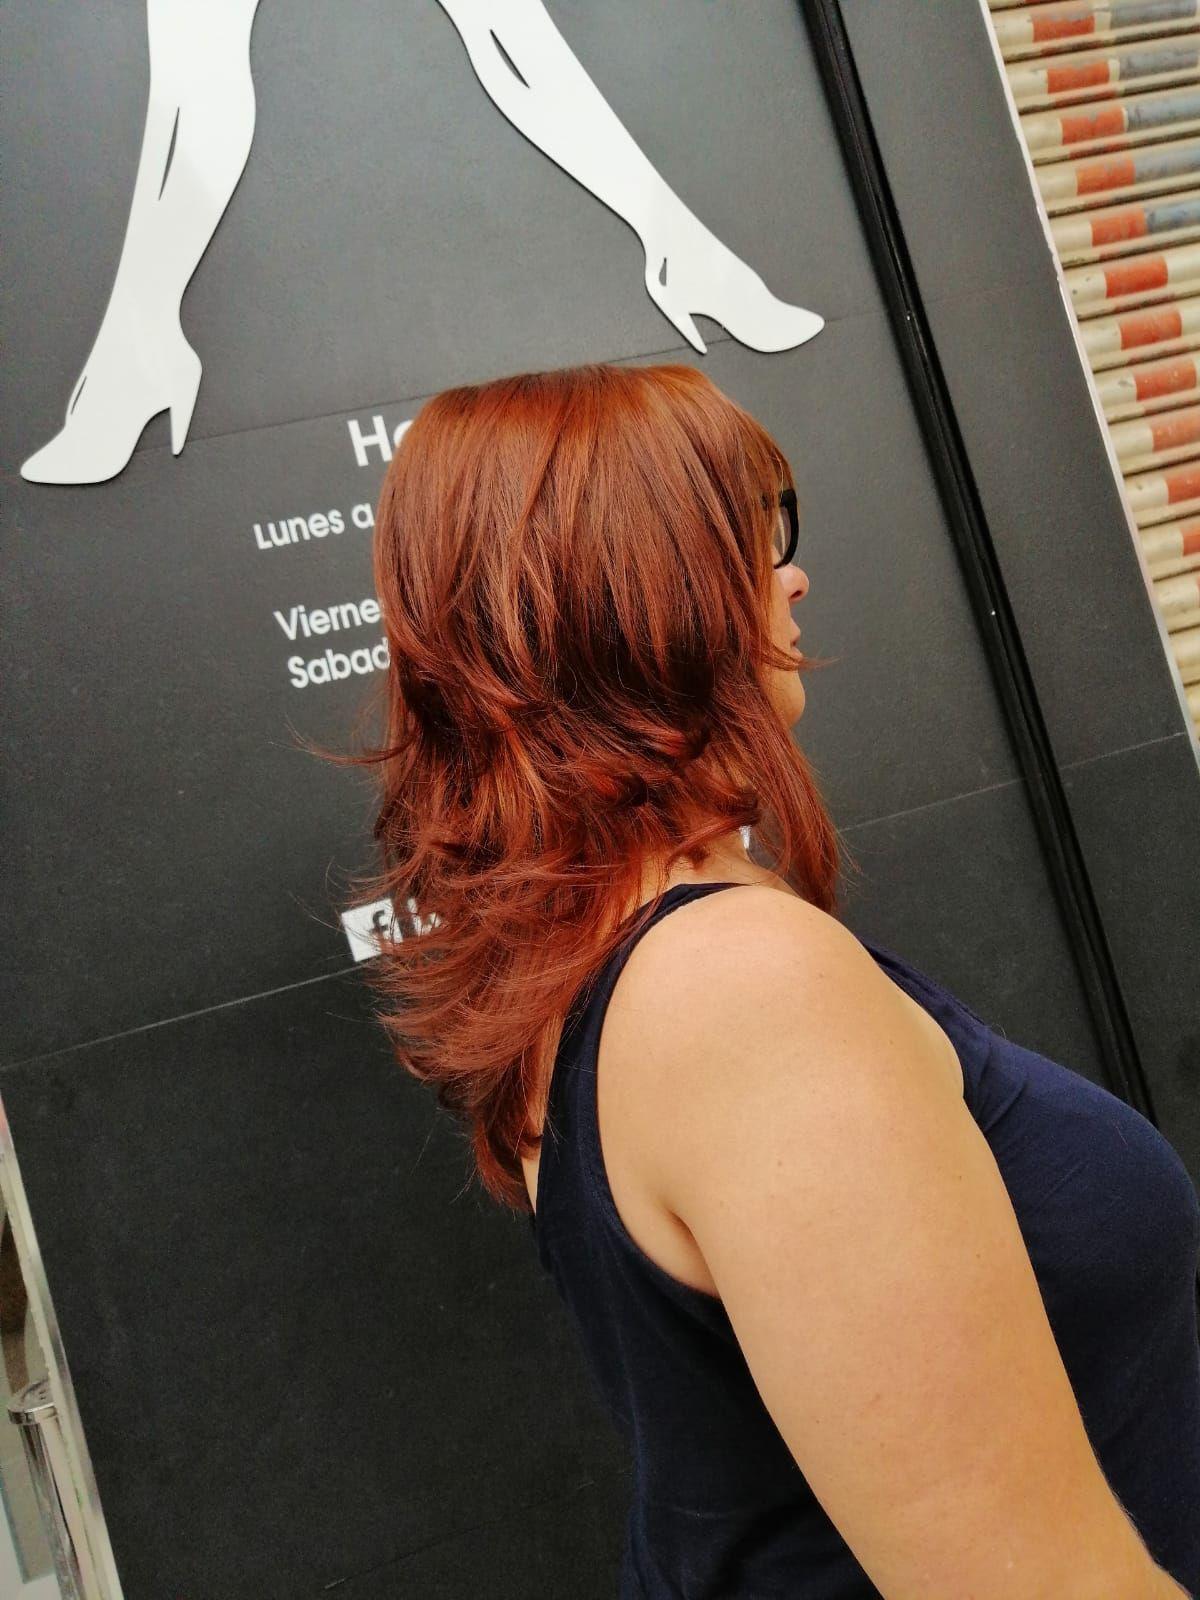 Foto 26 de Peluquería y maquillaje en  | Lucian Hair&Beauty